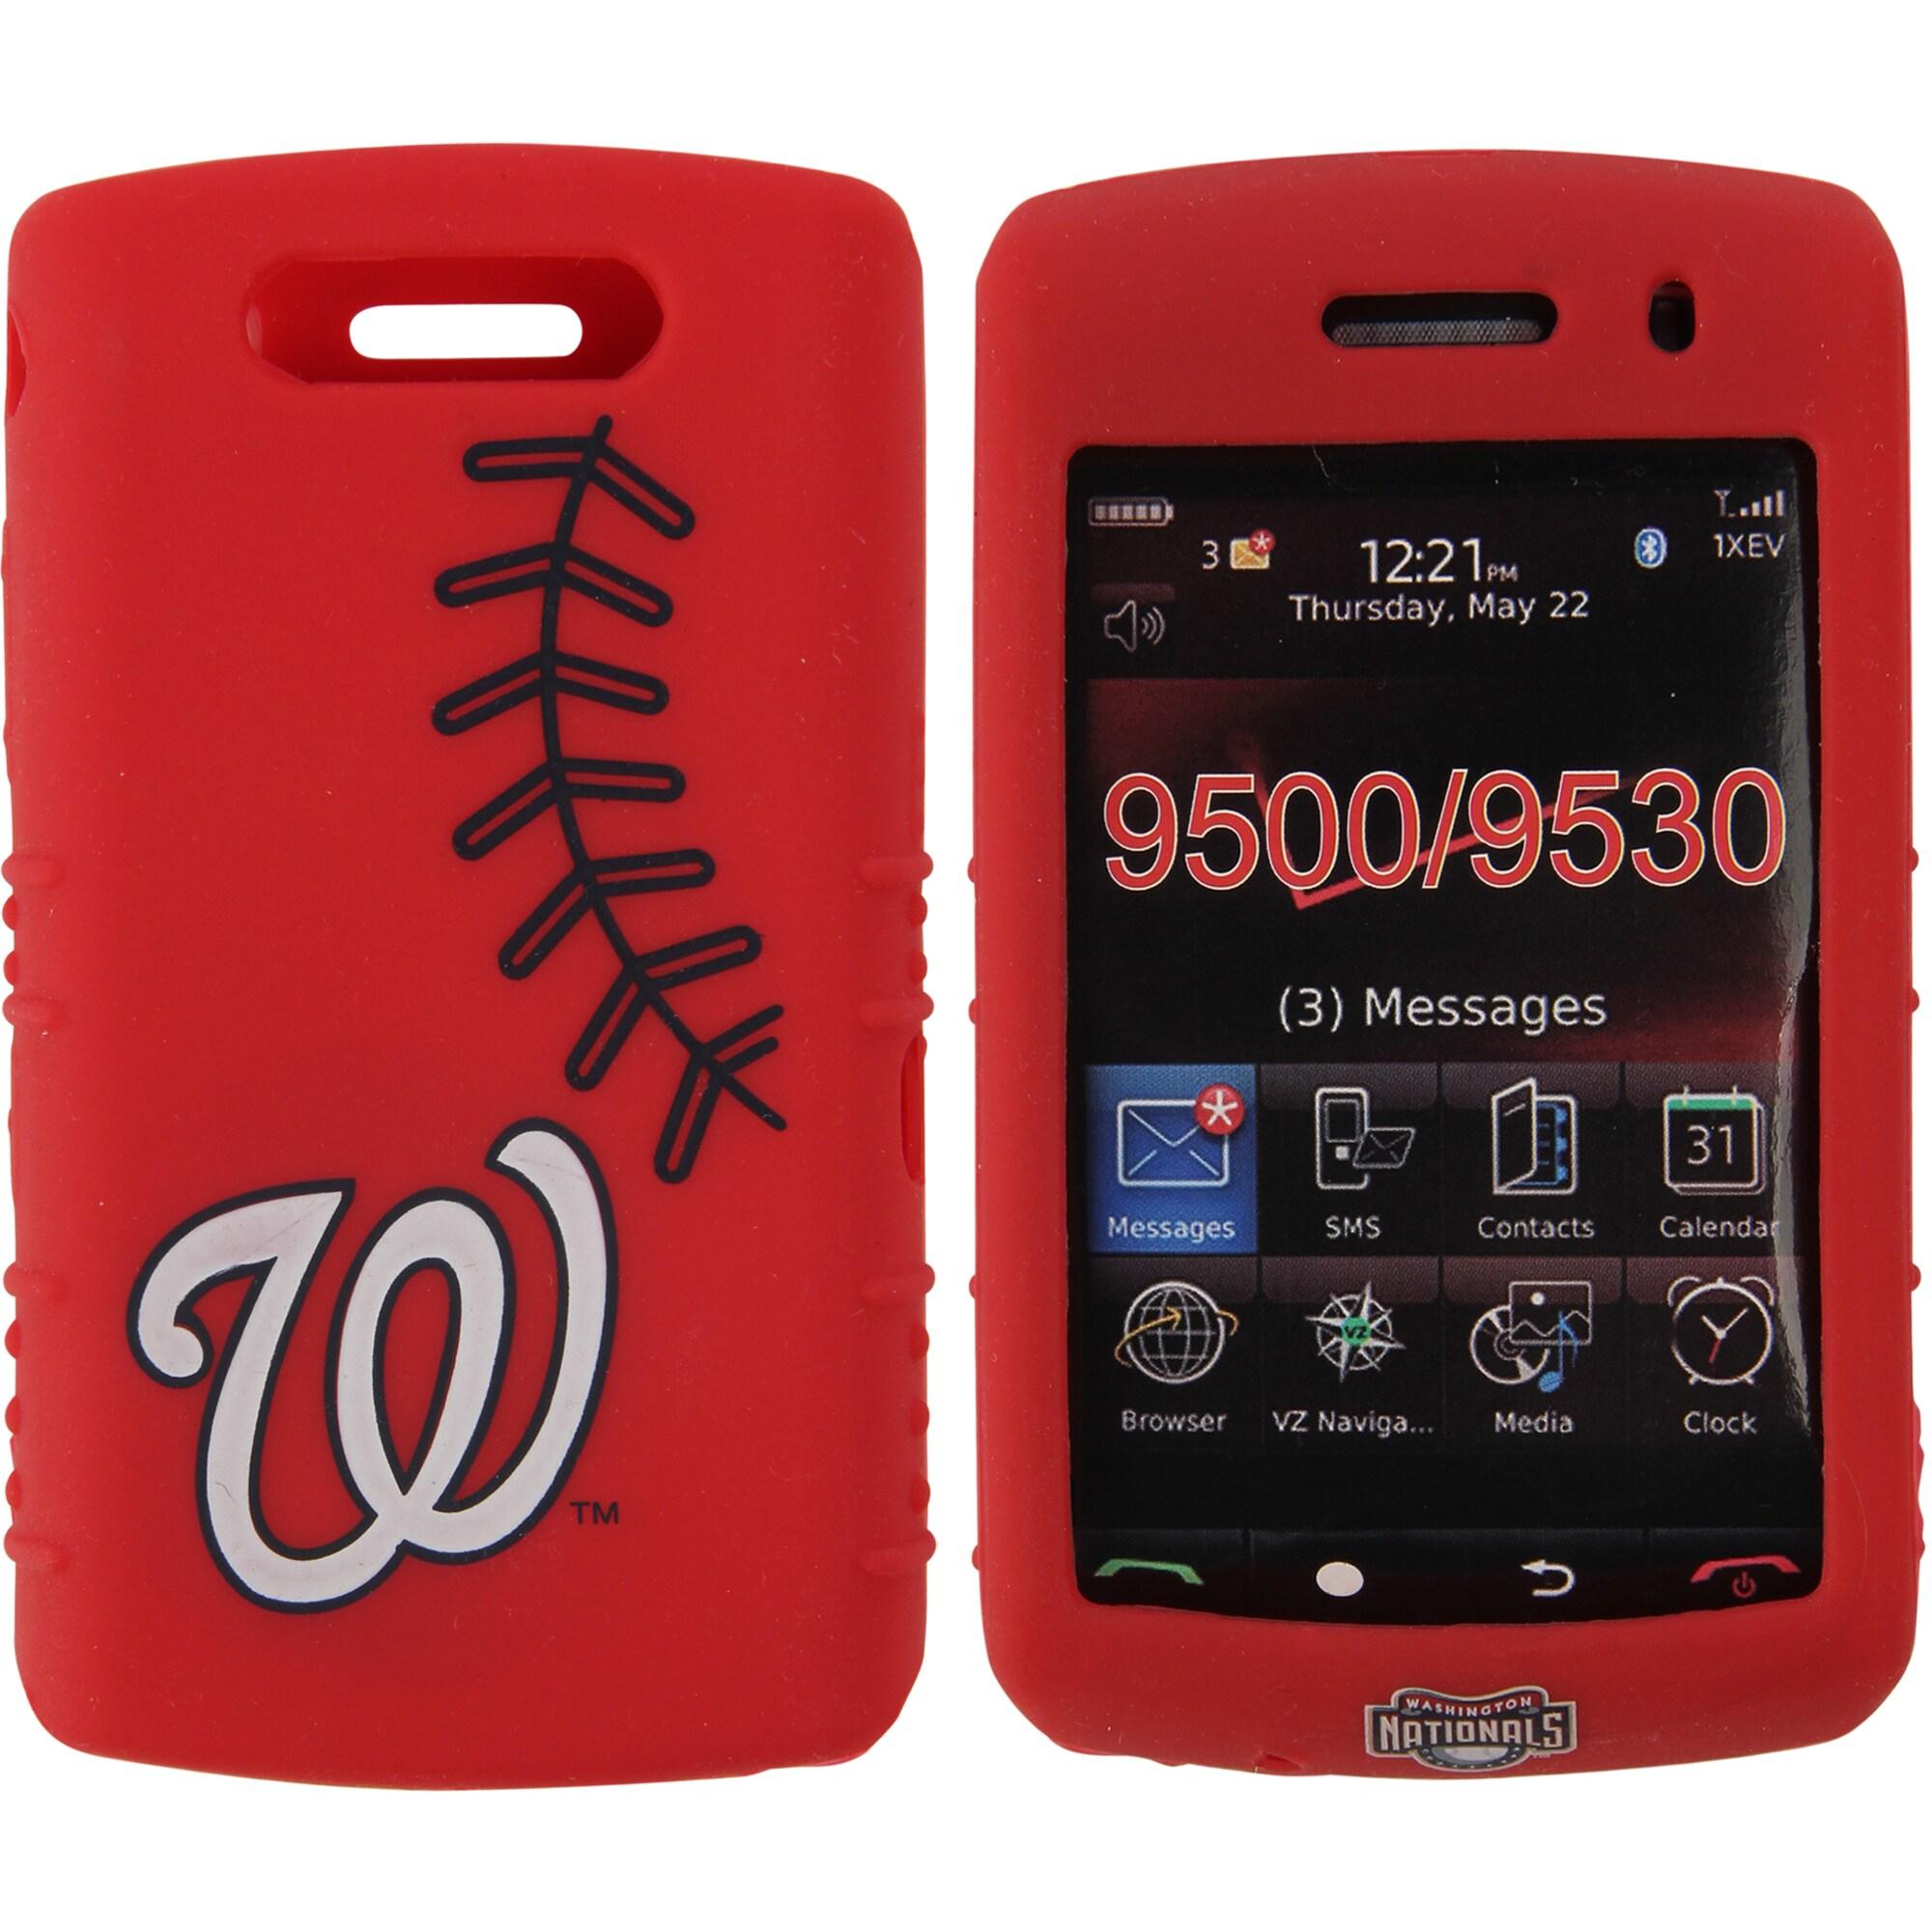 Washington Nationals BlackBerry Storm Cashmere Silicone Case - Red